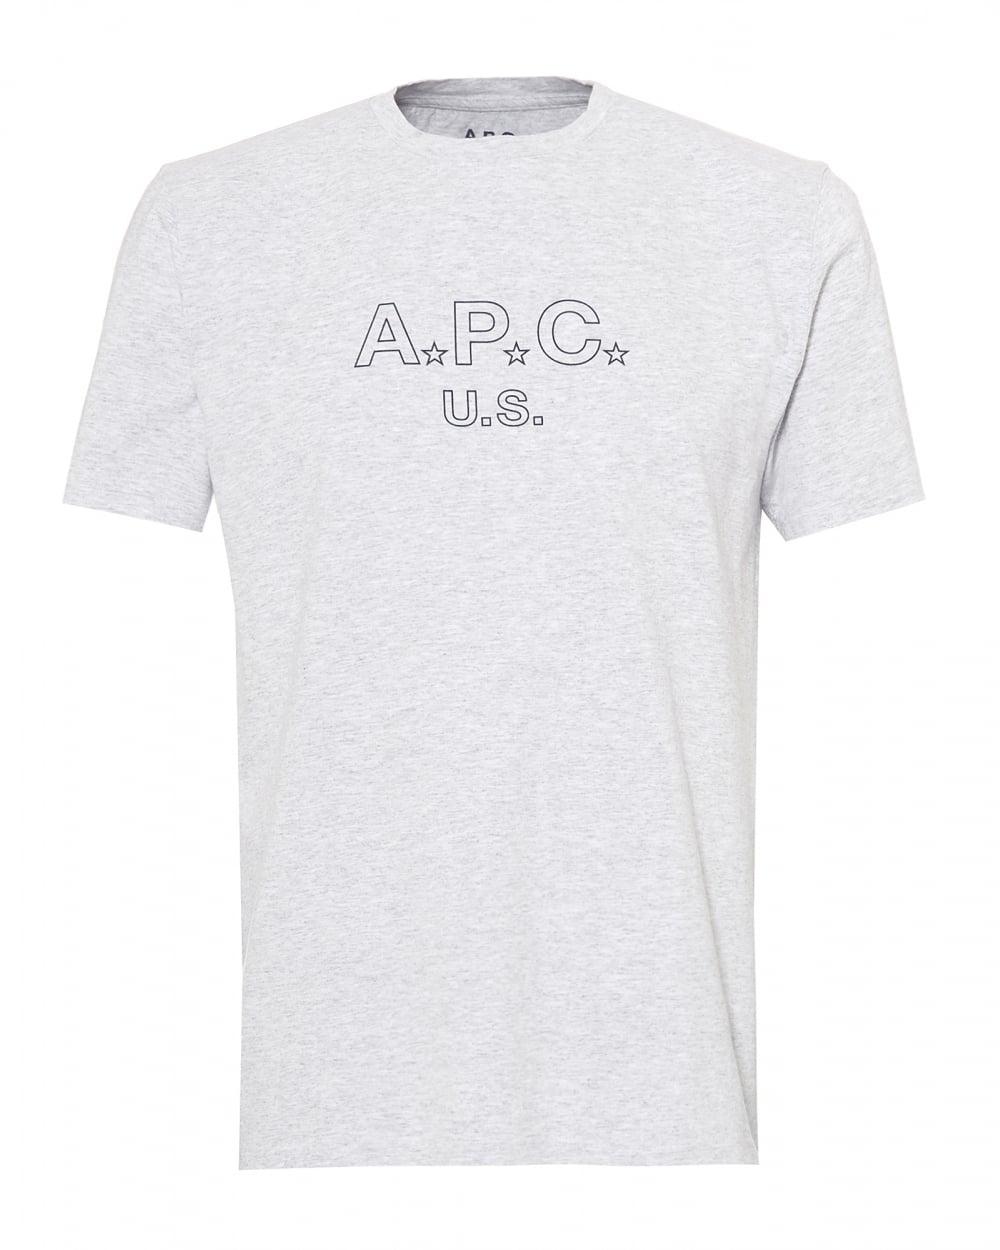 464efec7c173 a-p-c-mens-u-s-star-t-shirt-short-sleeve-grey-tee-p30656-123165_image.jpg